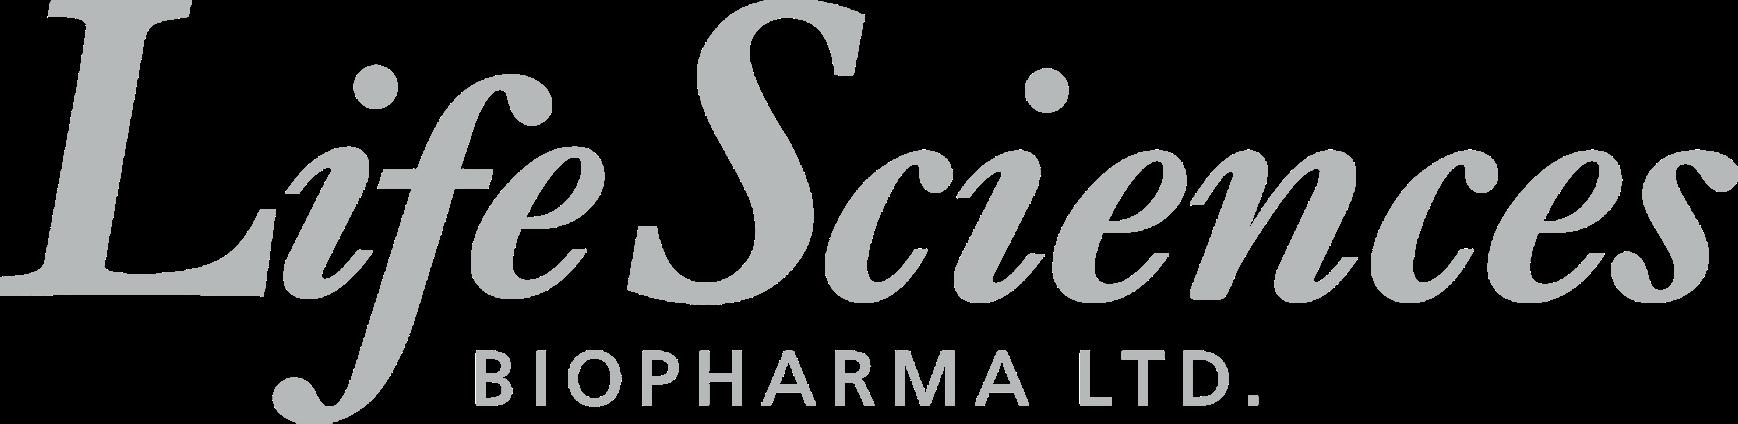 Life Sciences Biopharma Logo